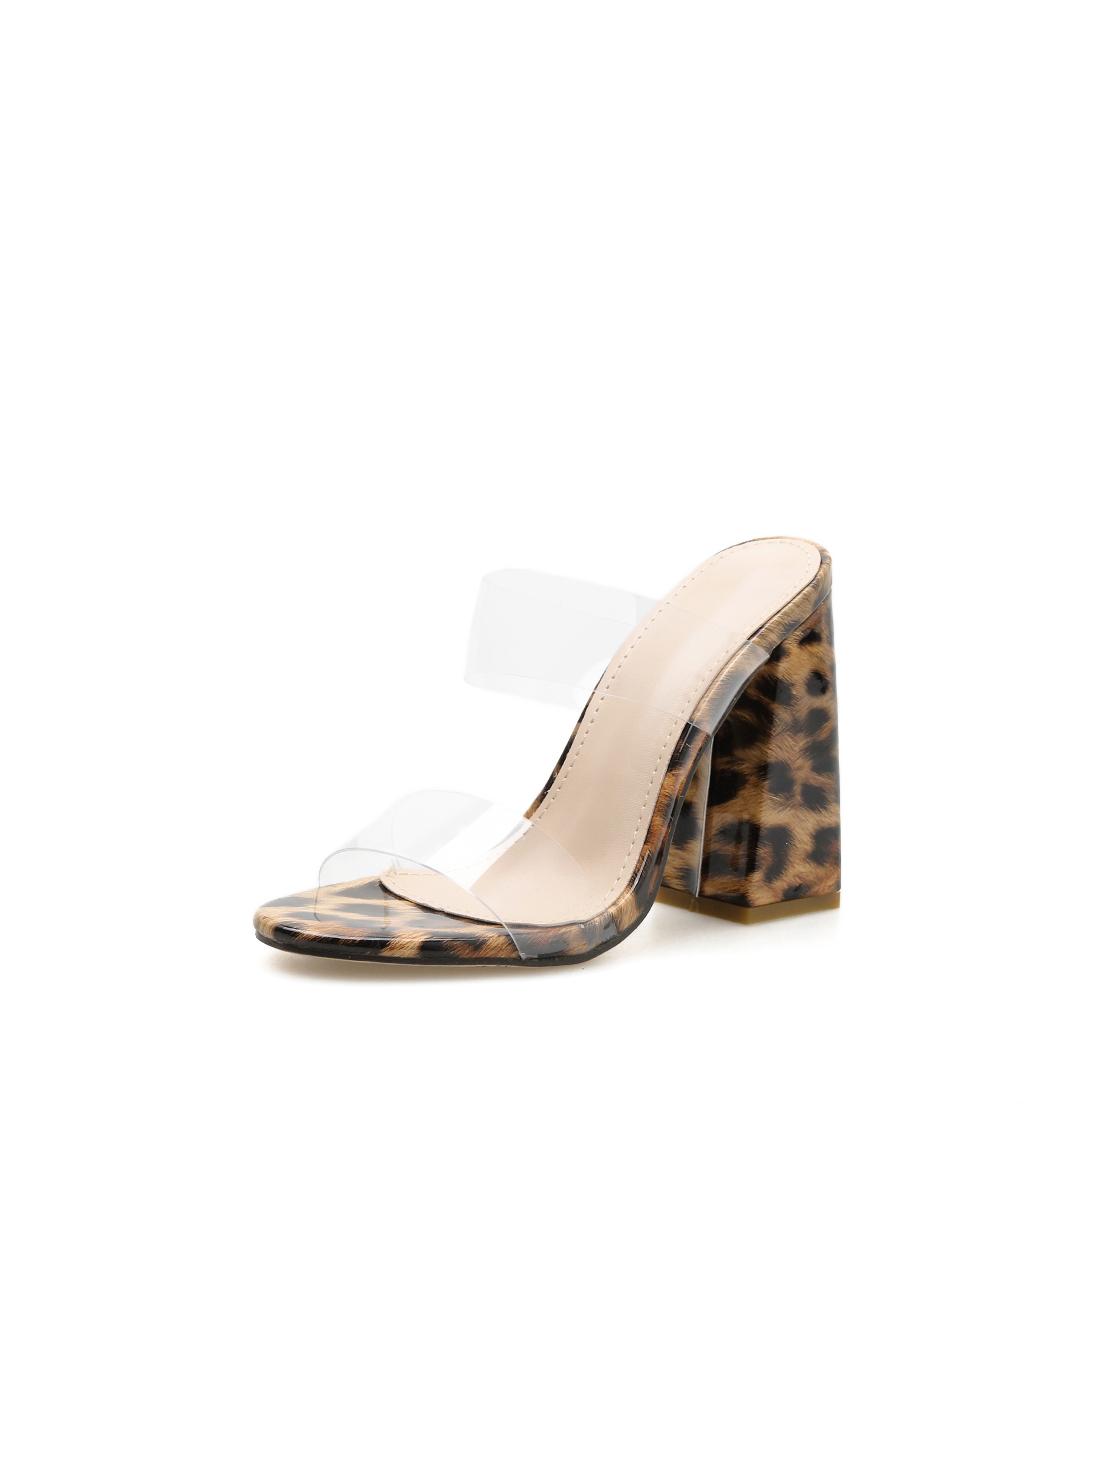 PVC Leopard Printed Chunky Heel Slippers